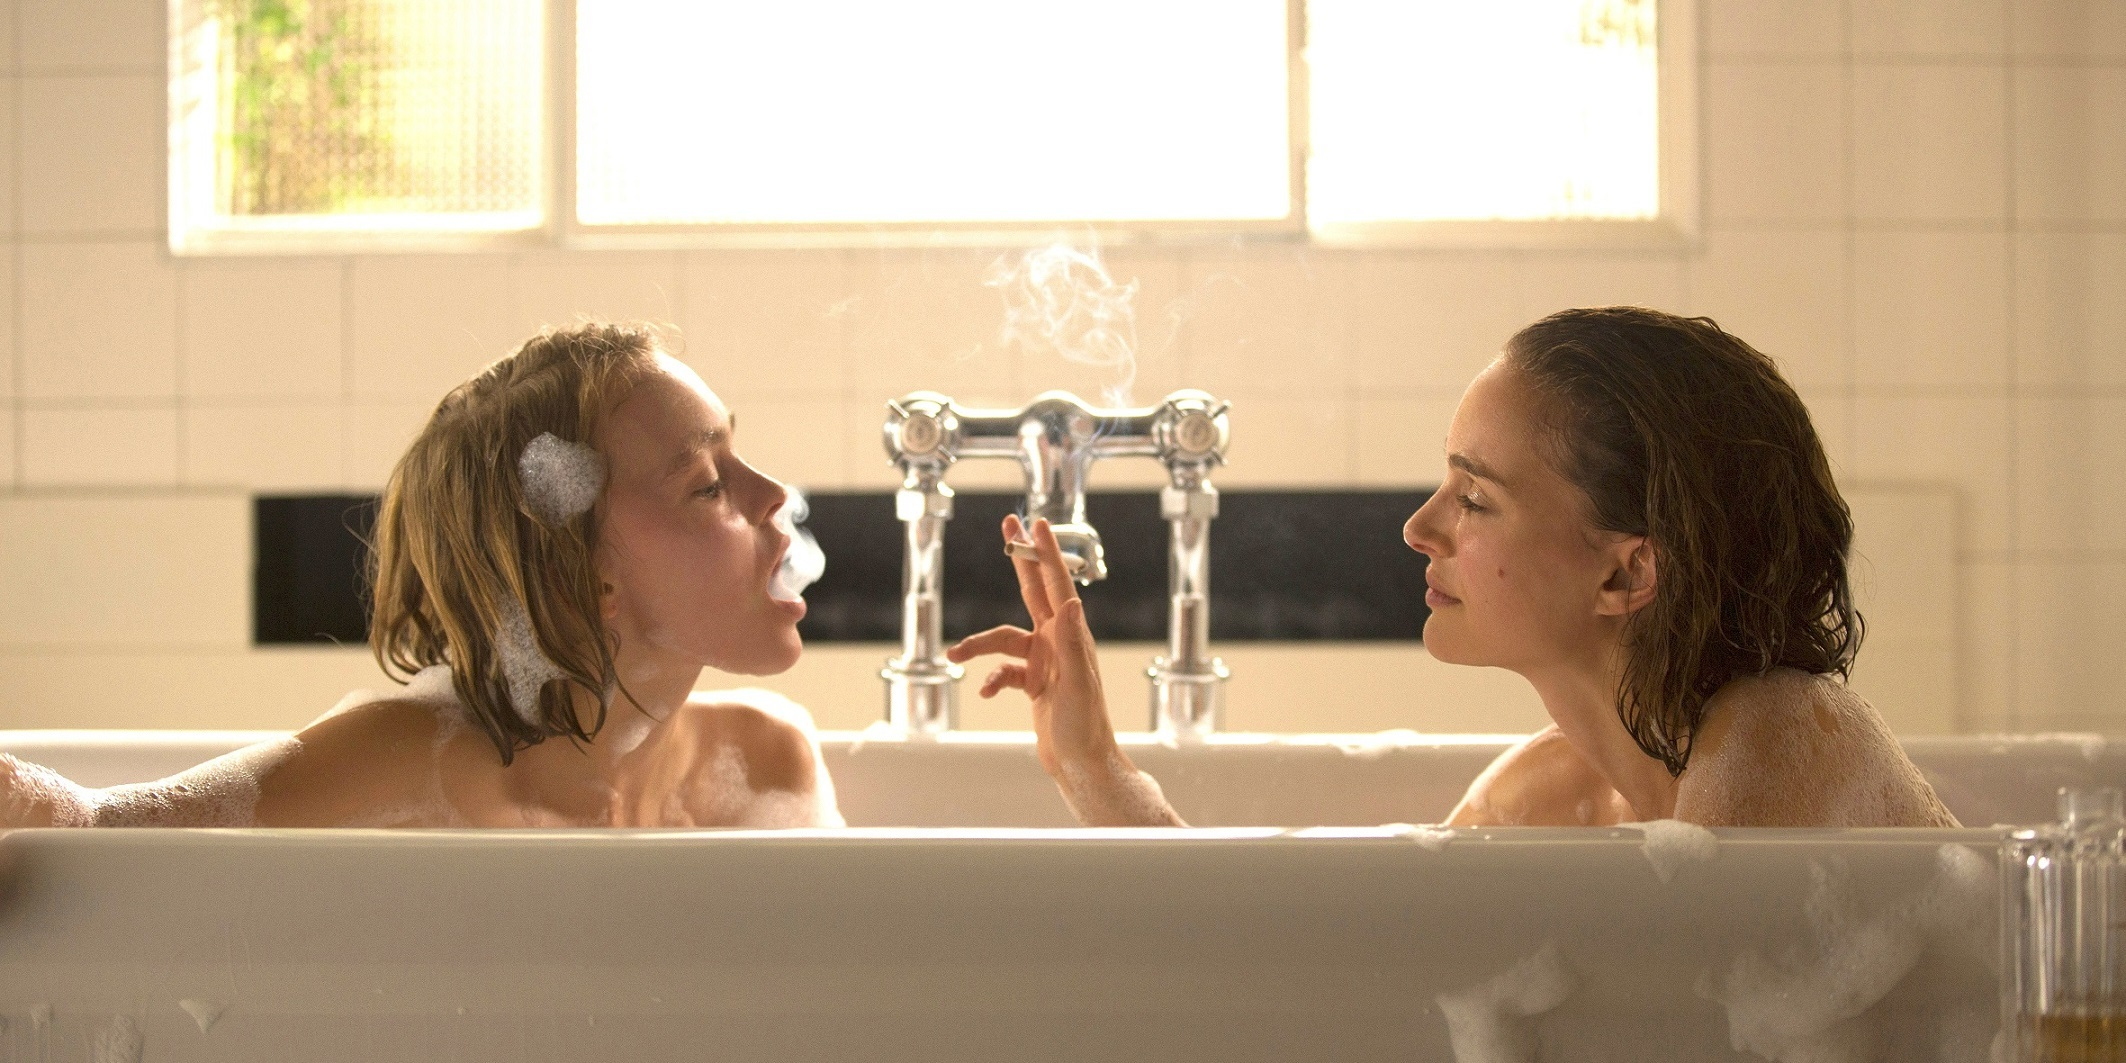 (C)Les Films Velvet - Les Films du Fleuve - France 3 Cinema - Kinology - Proximus – RTB